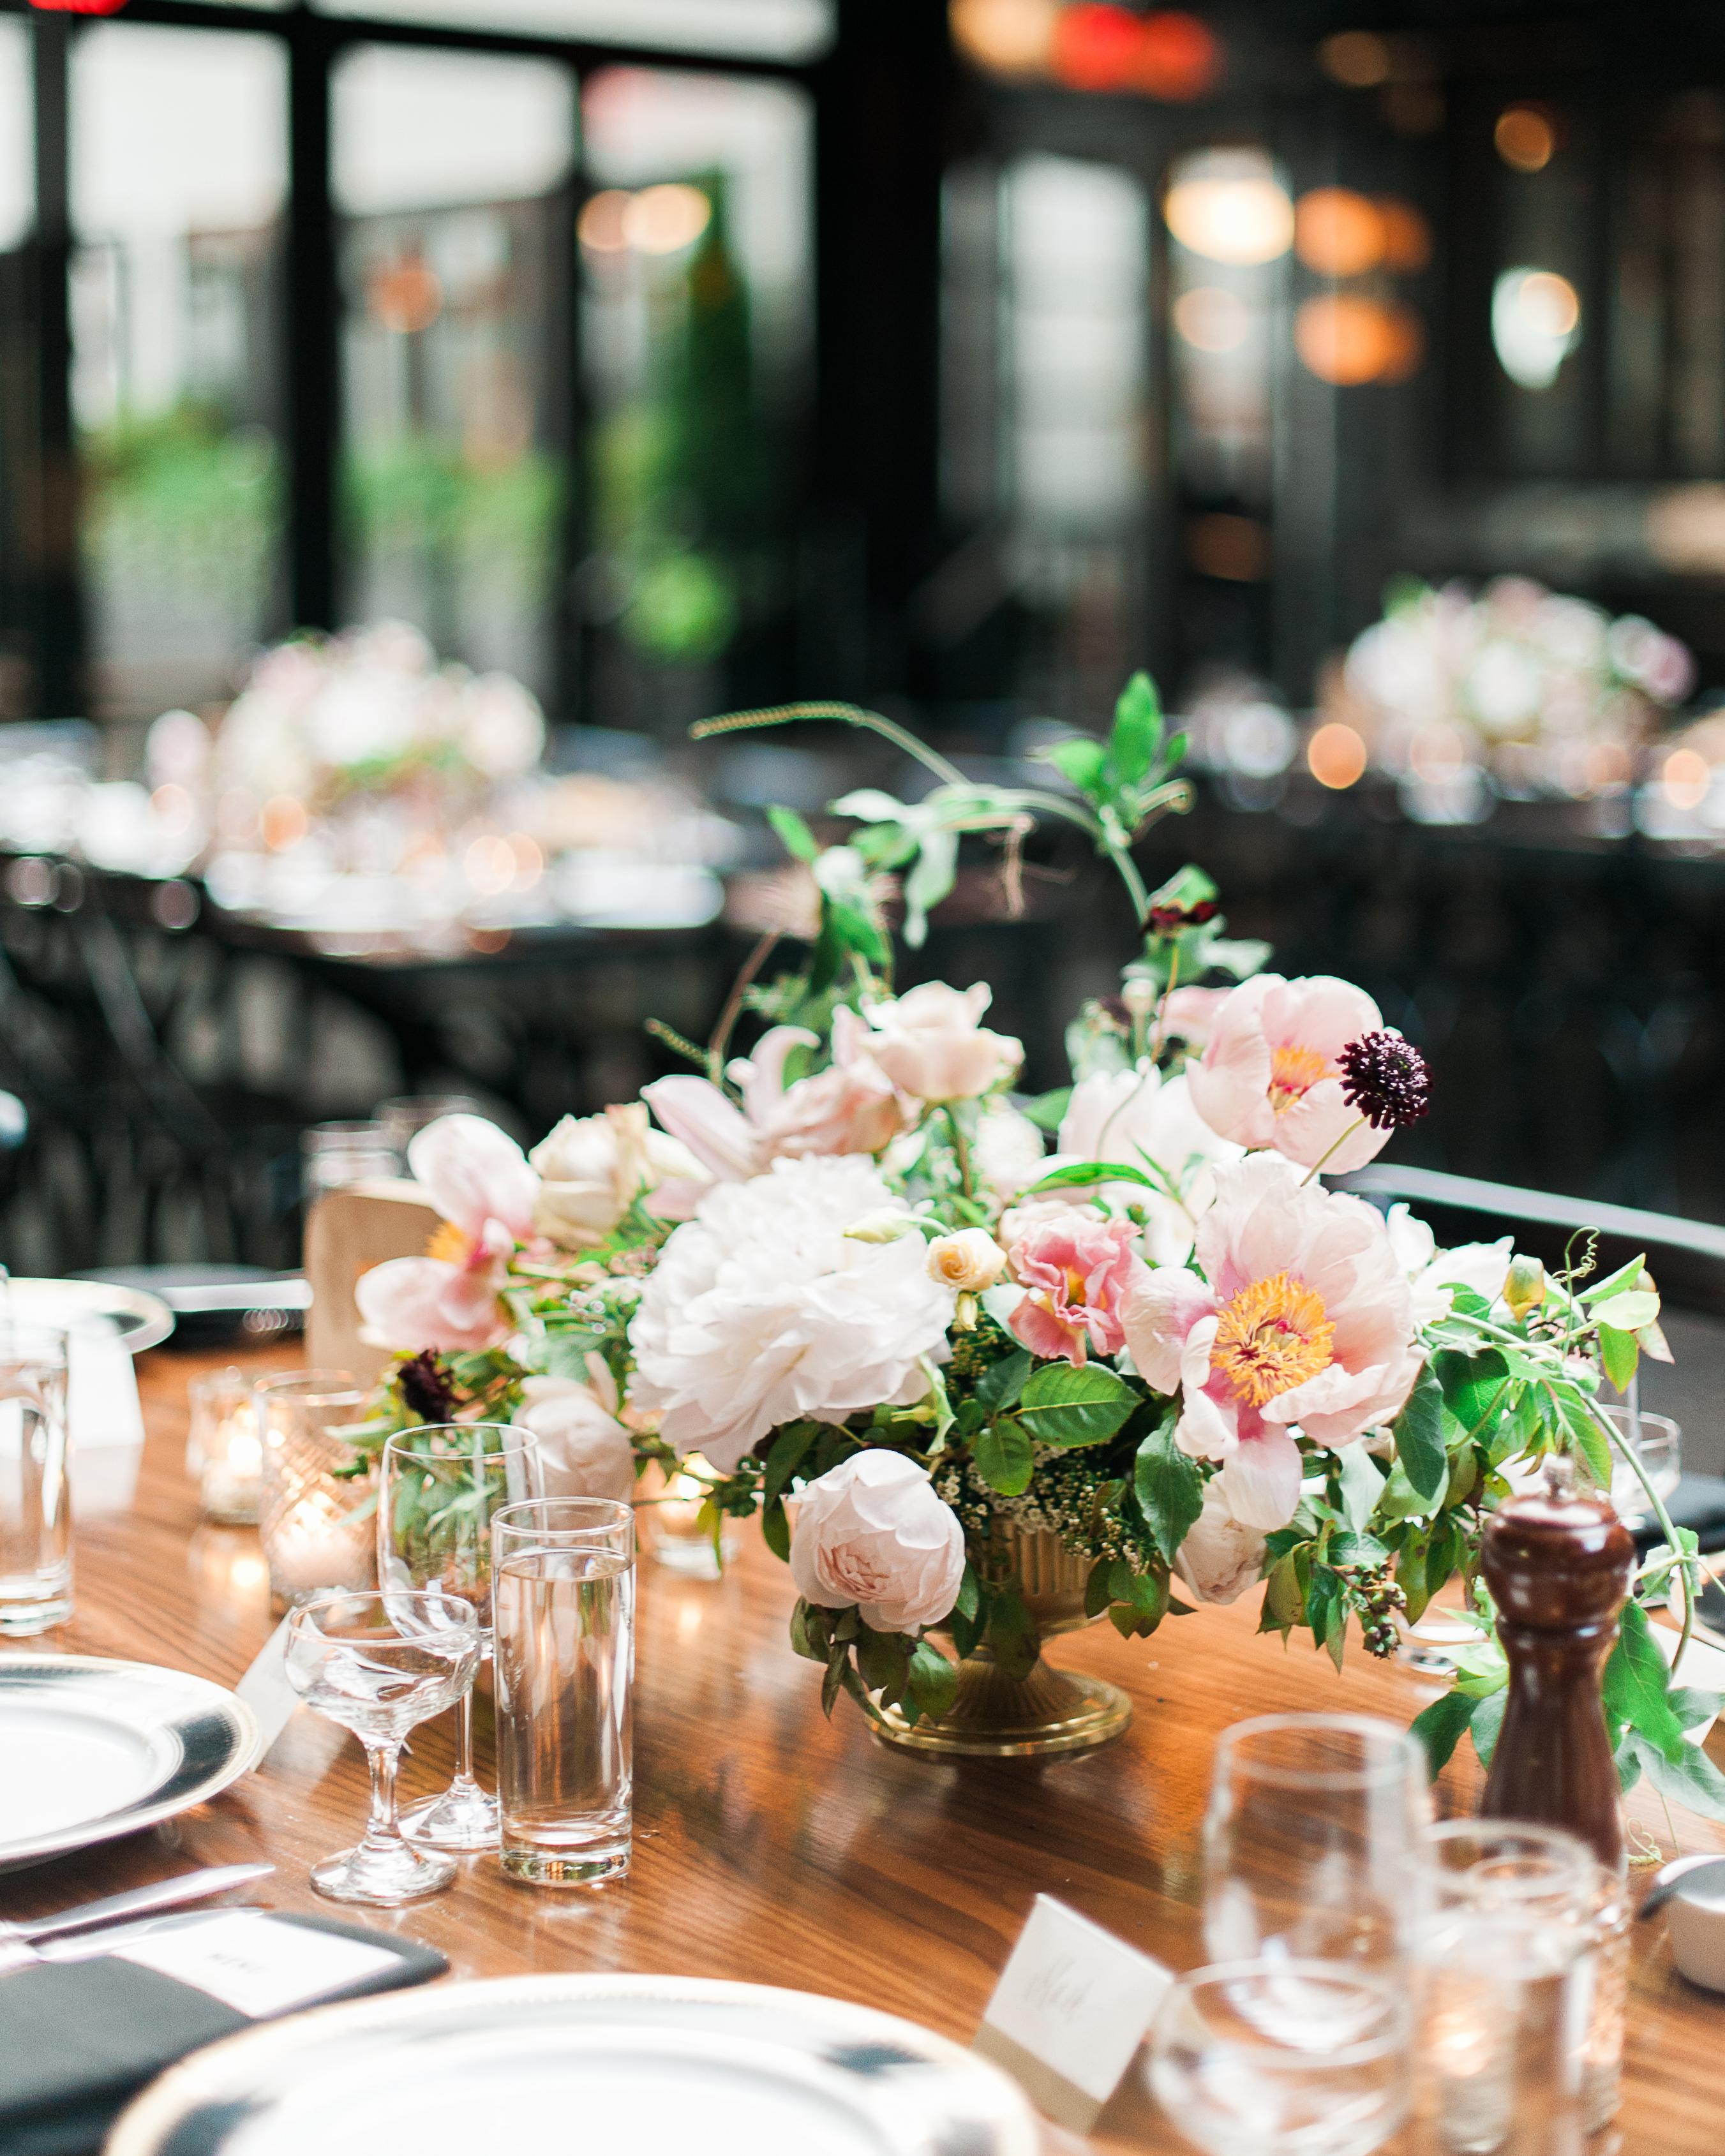 ashley-jonathon-wedding-centerpiece-65-s111483-0914.jpg